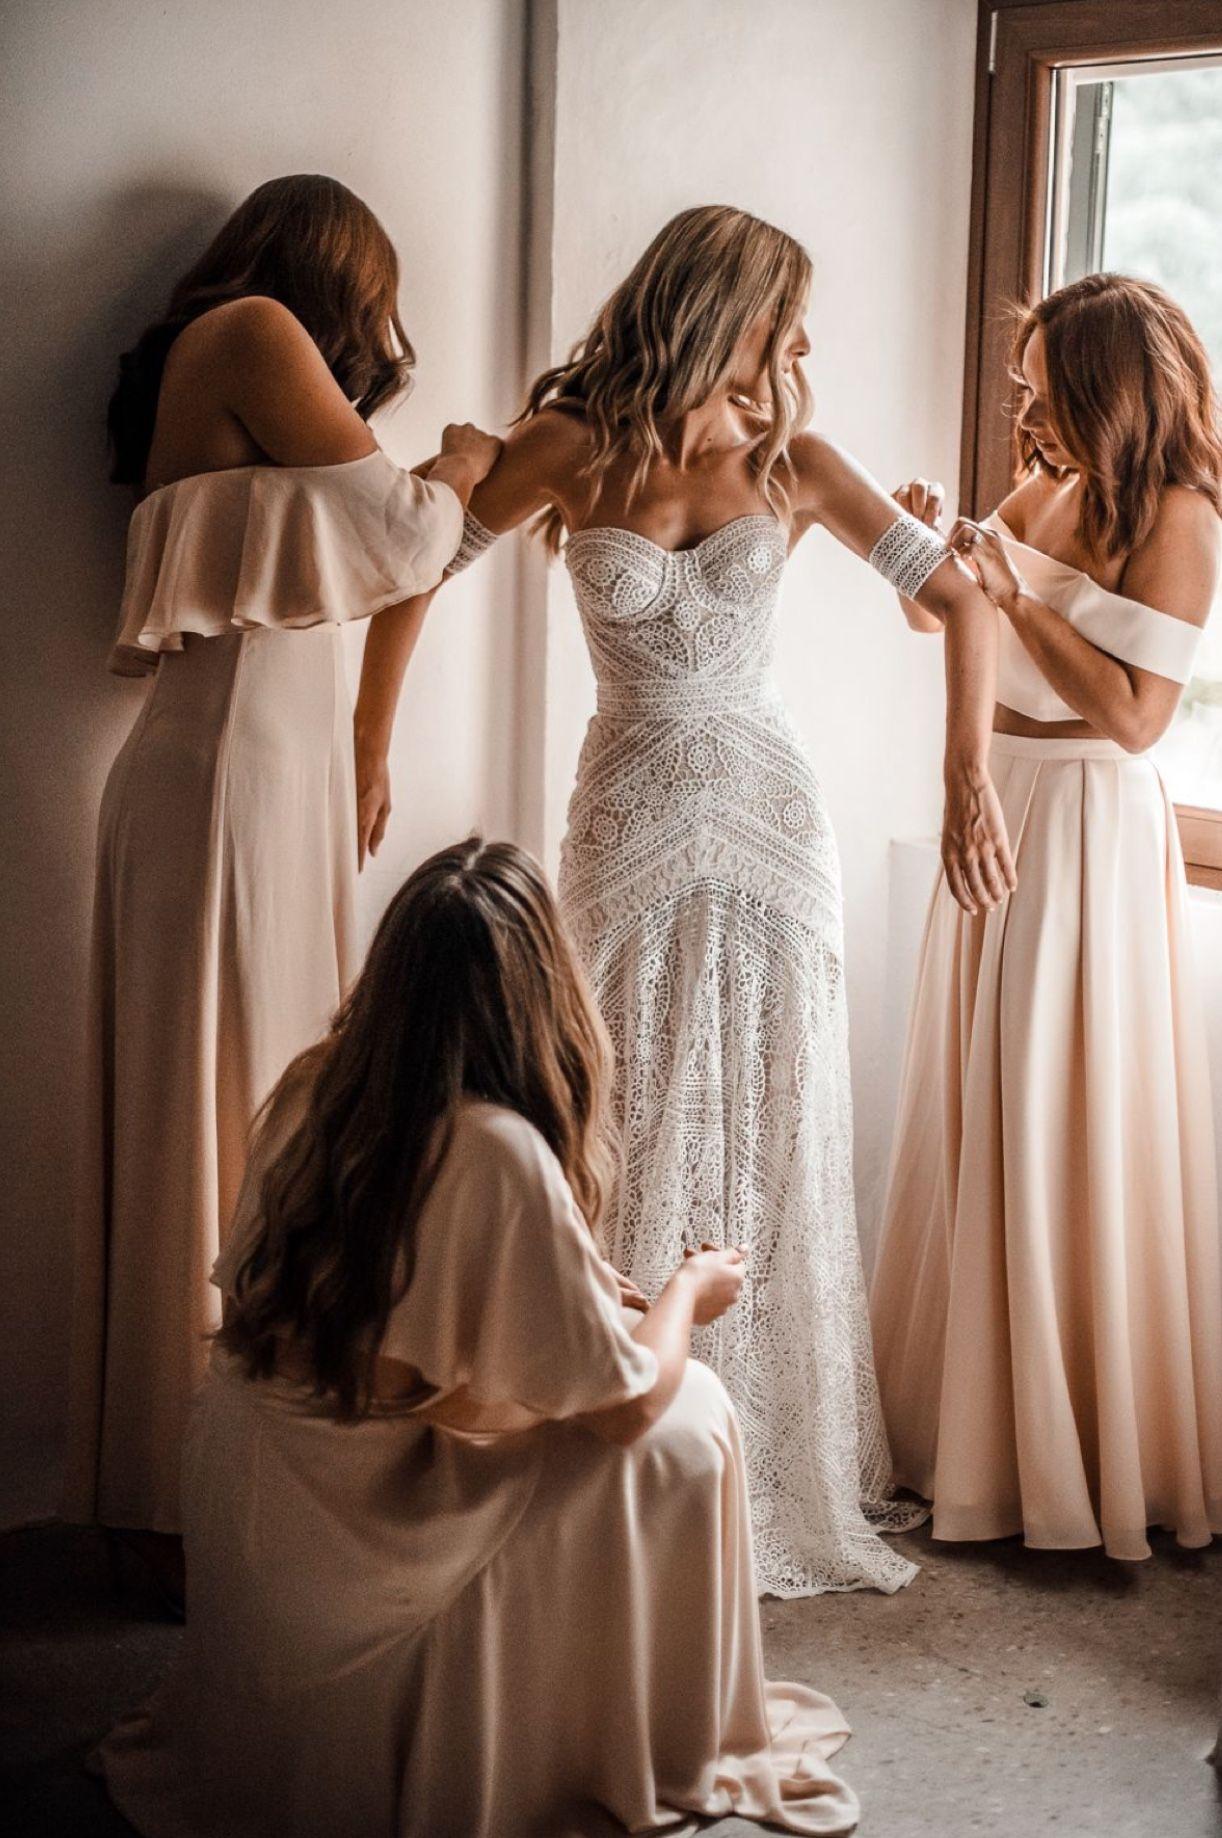 Pin by thalia lopez on someday in pinterest wedding